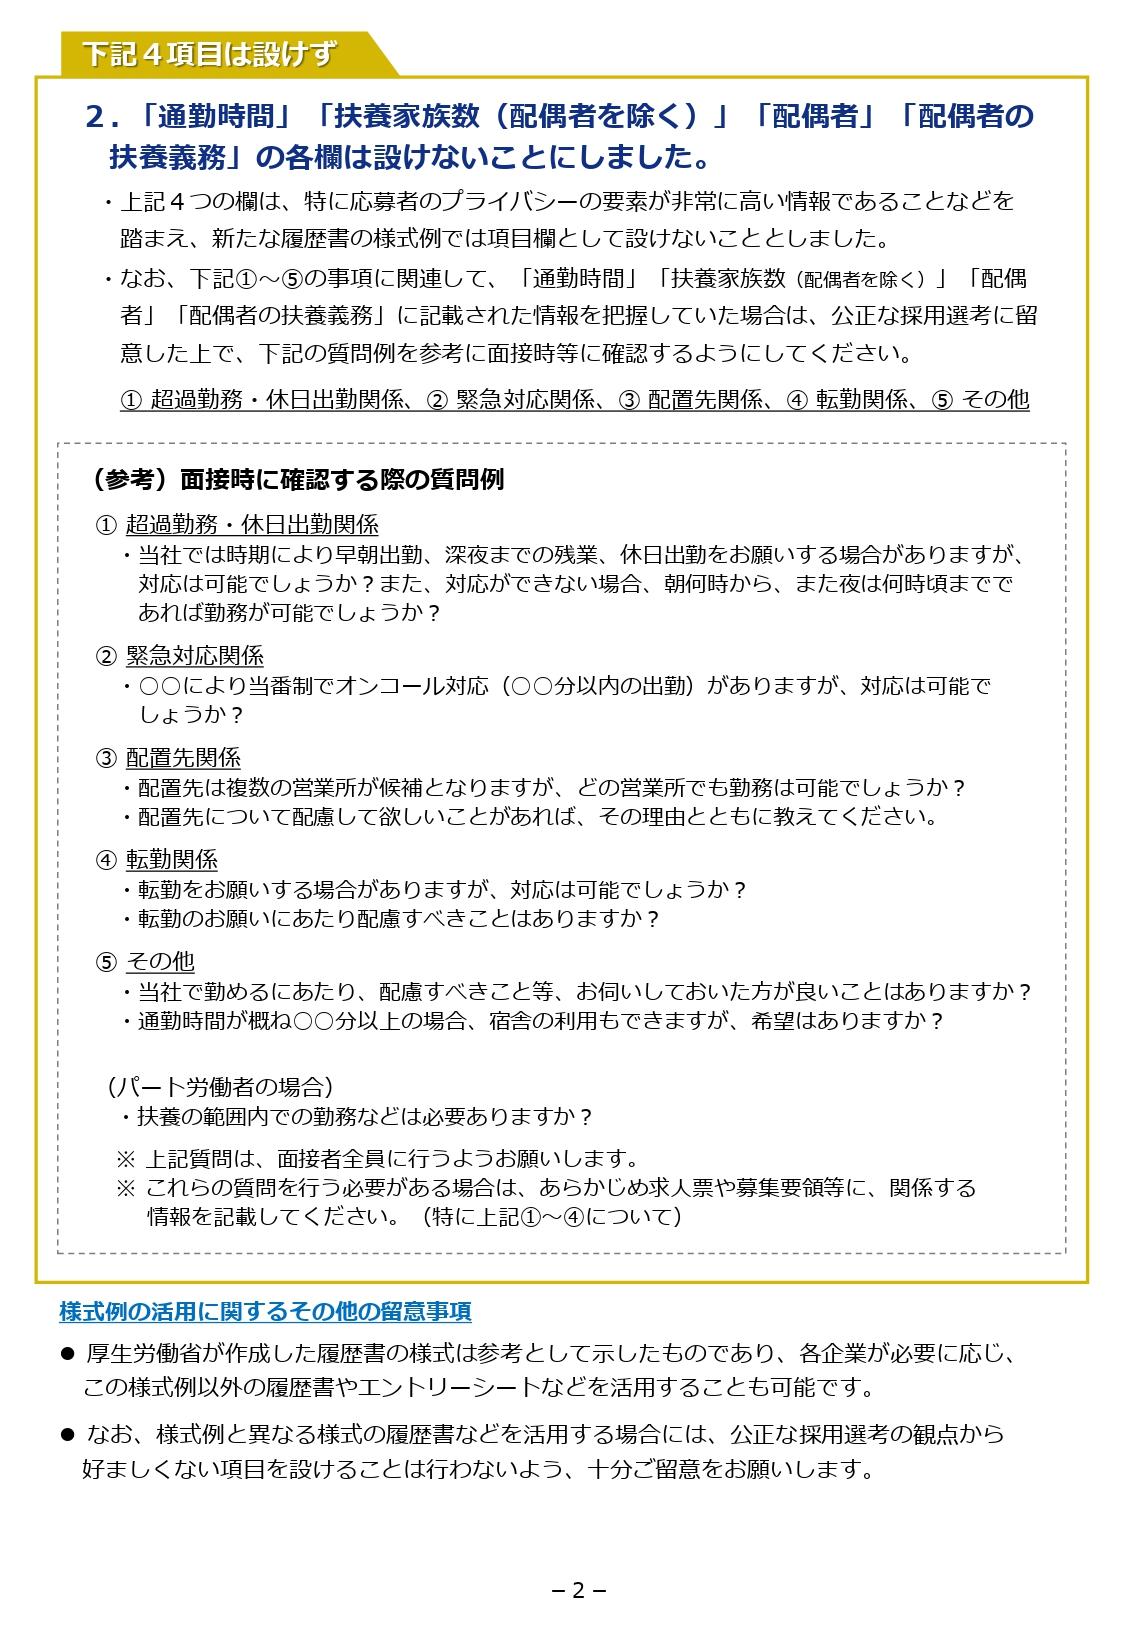 09_page0002.jpg